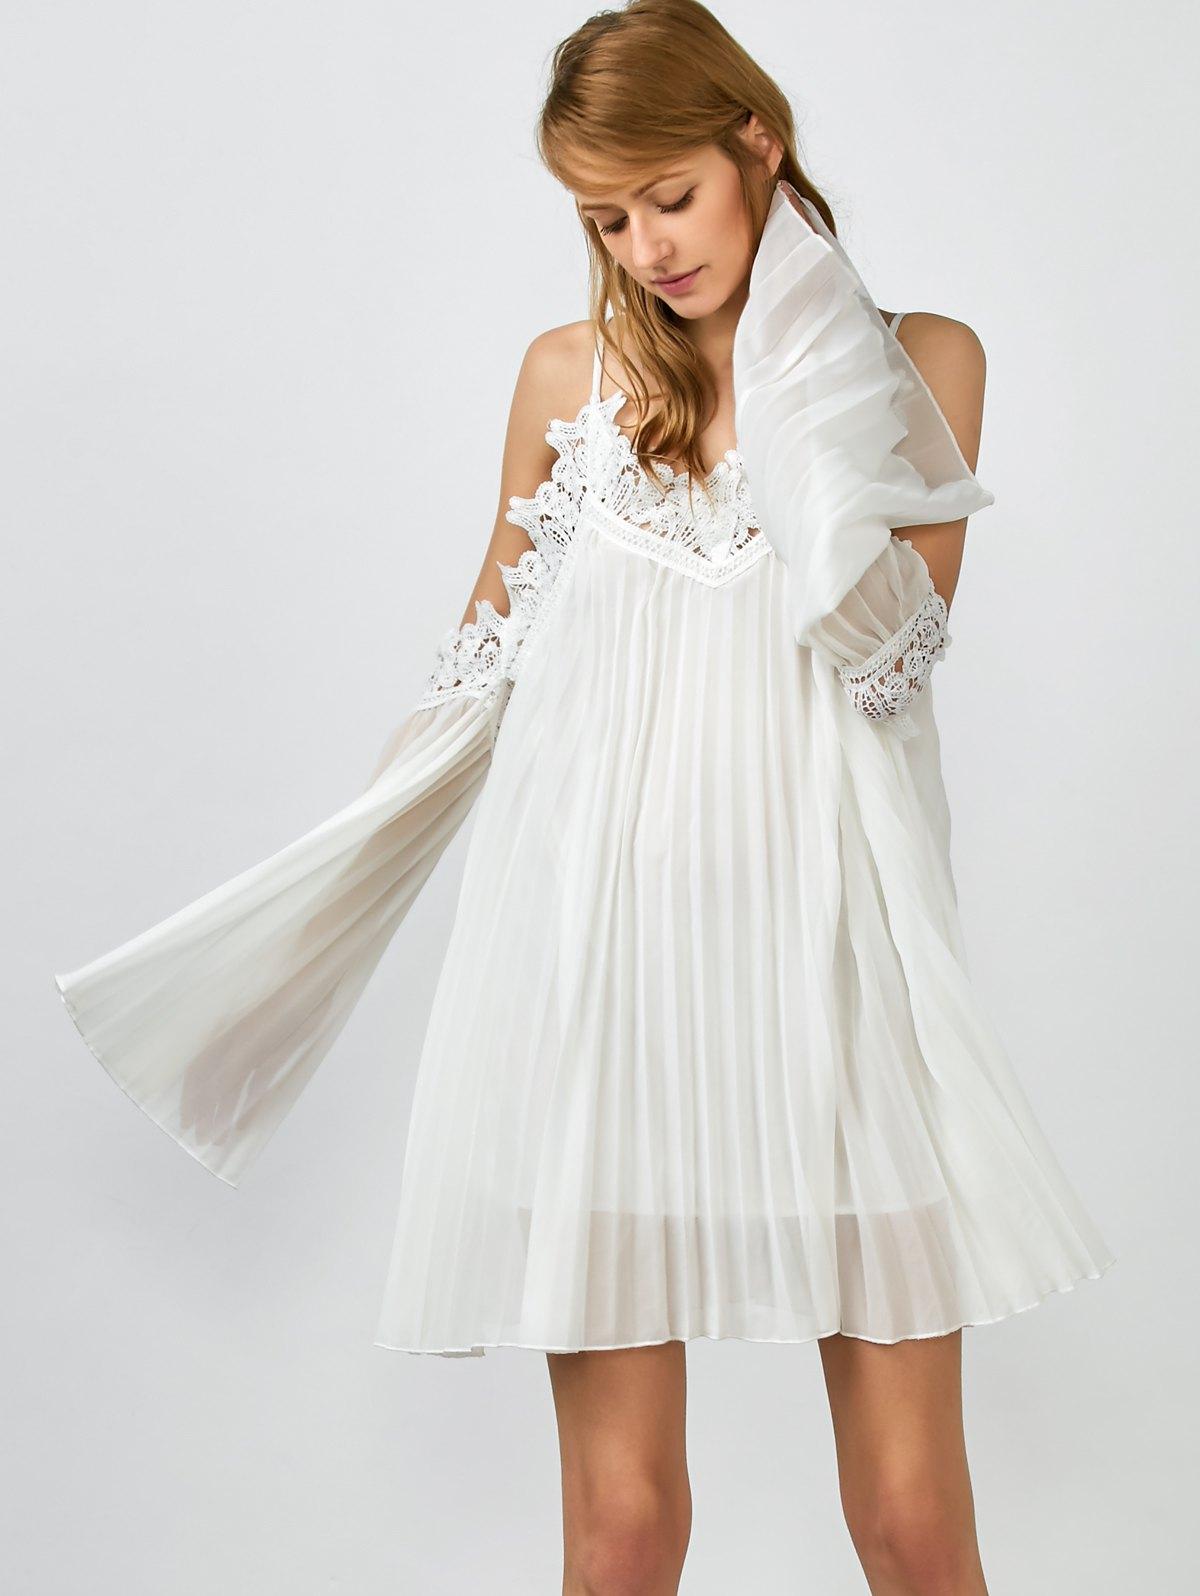 Romantic White Dress In Venezia